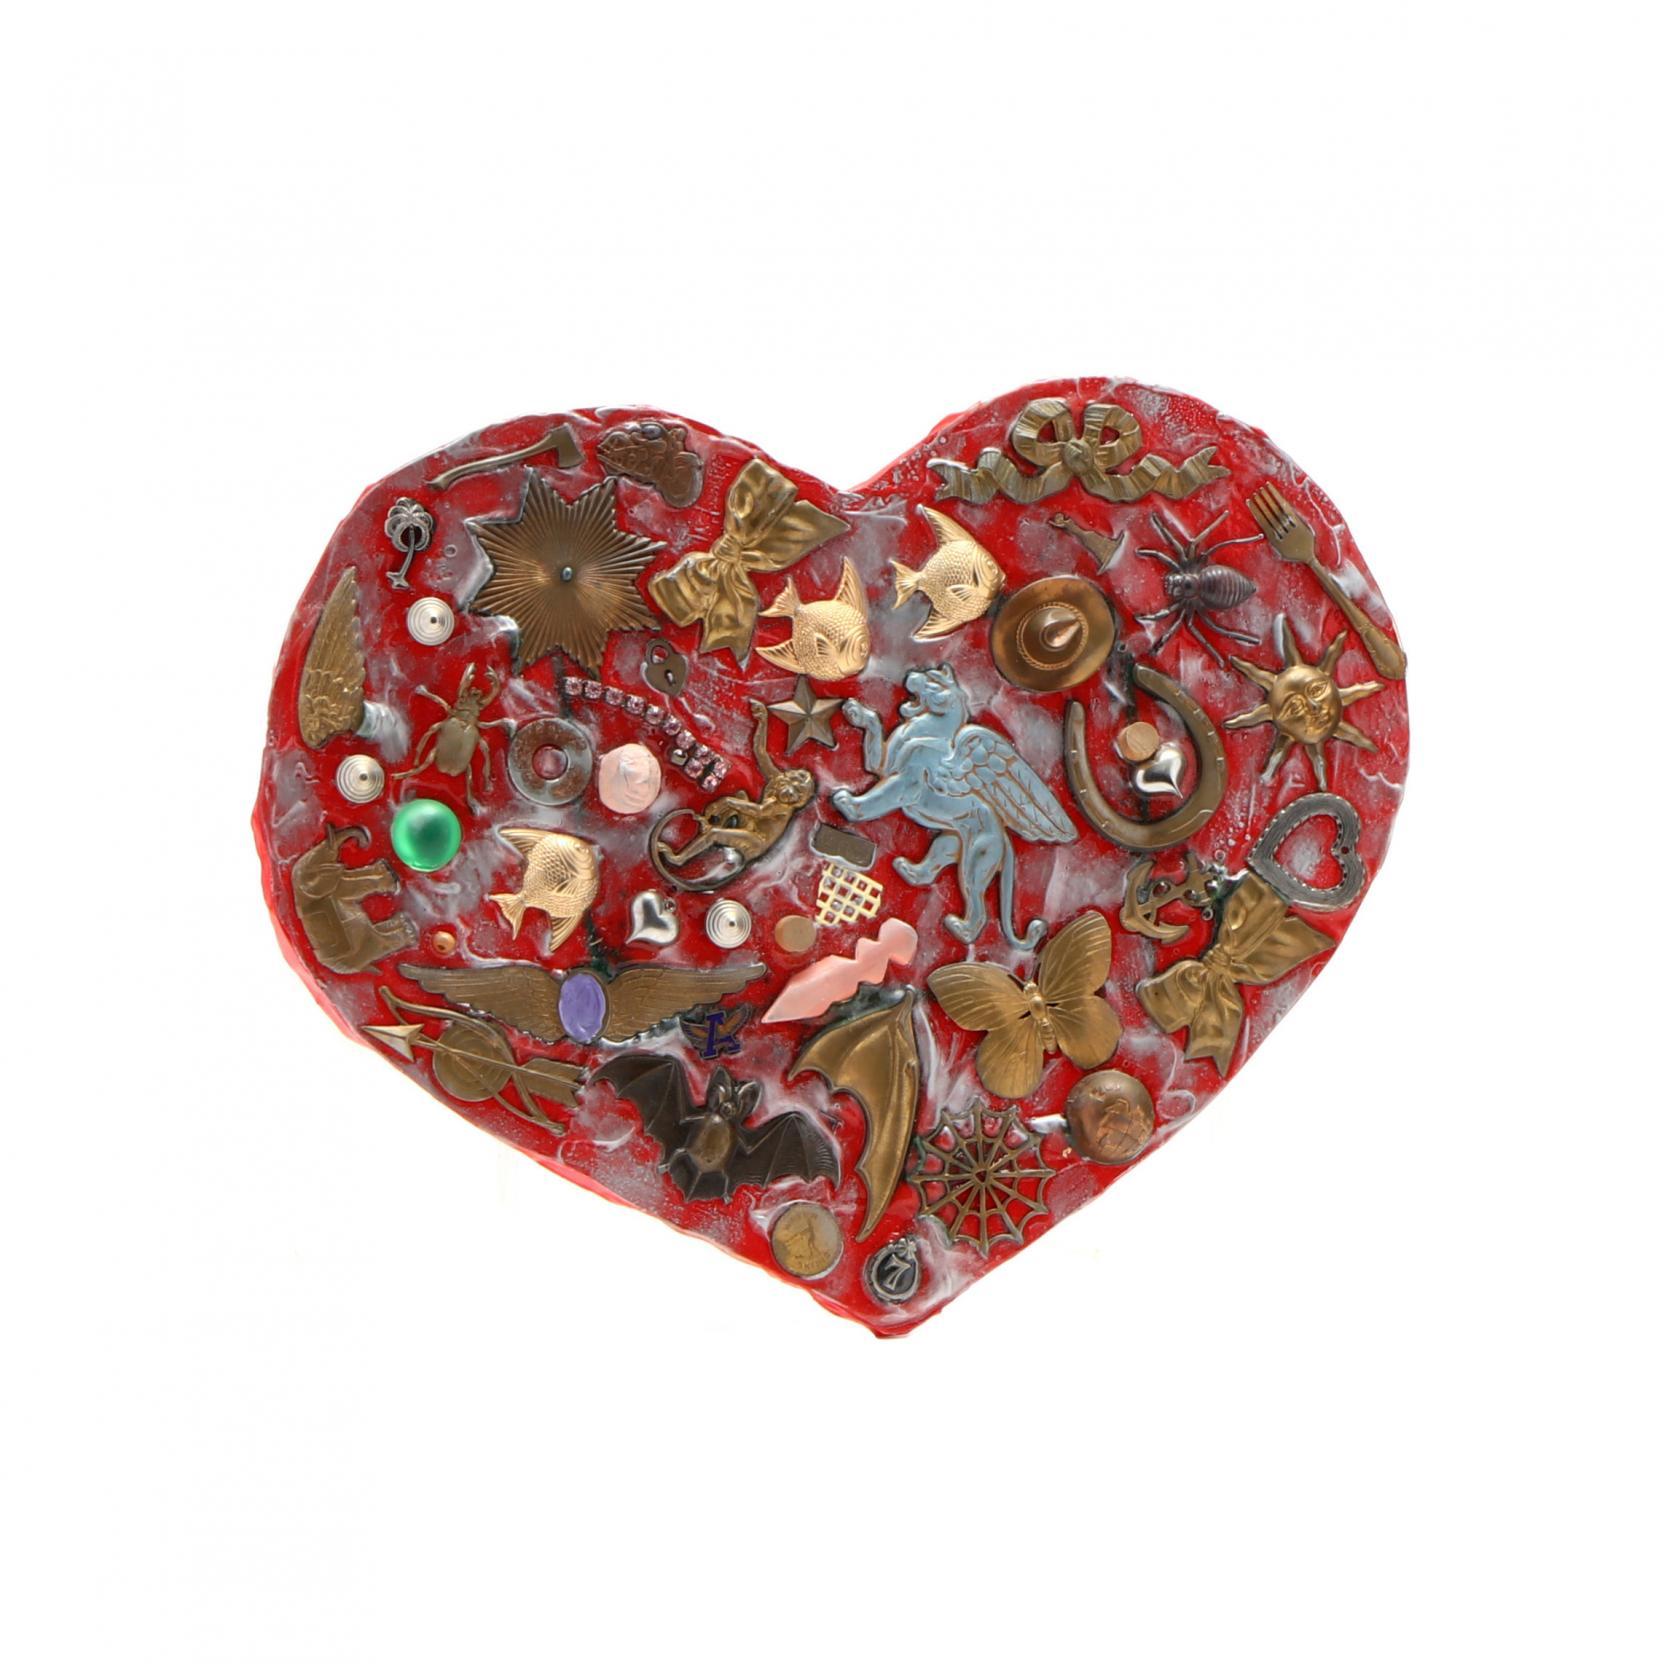 paul-hrusovsky-nc-heart-shaped-milagro-wall-plaque